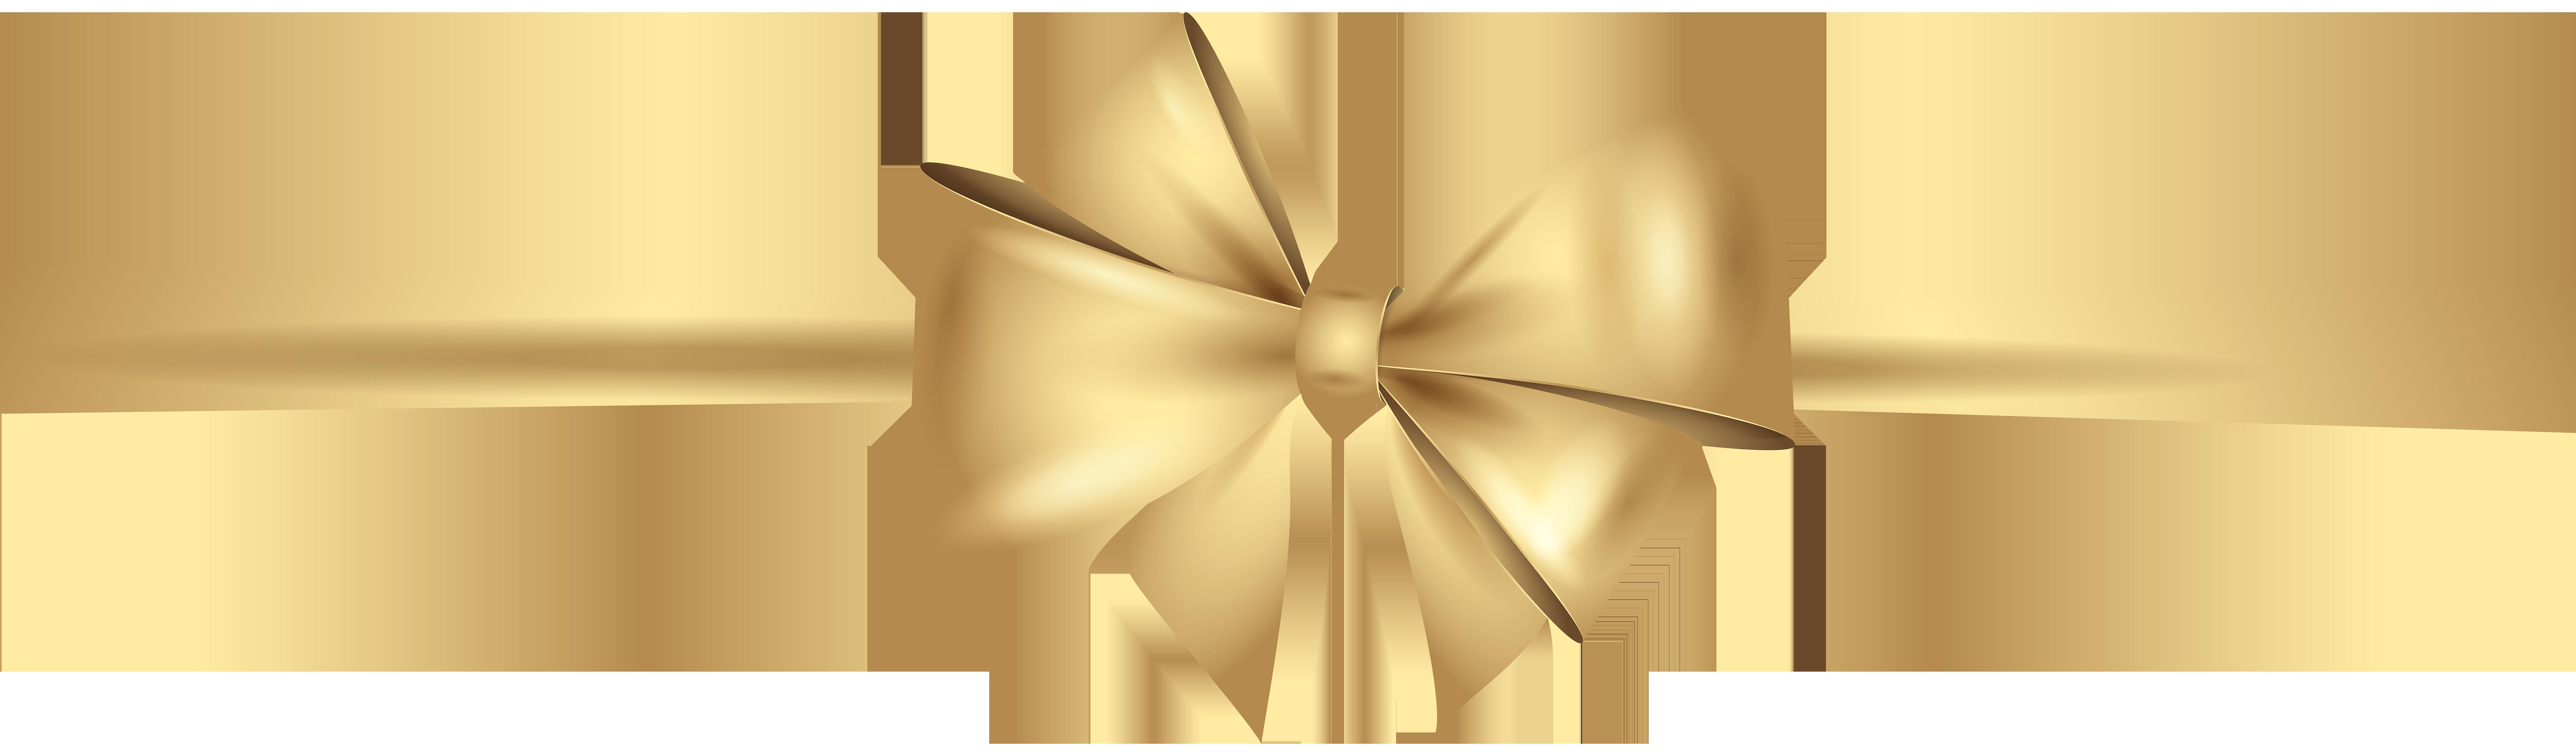 Gold Ribbon Clipart Png.